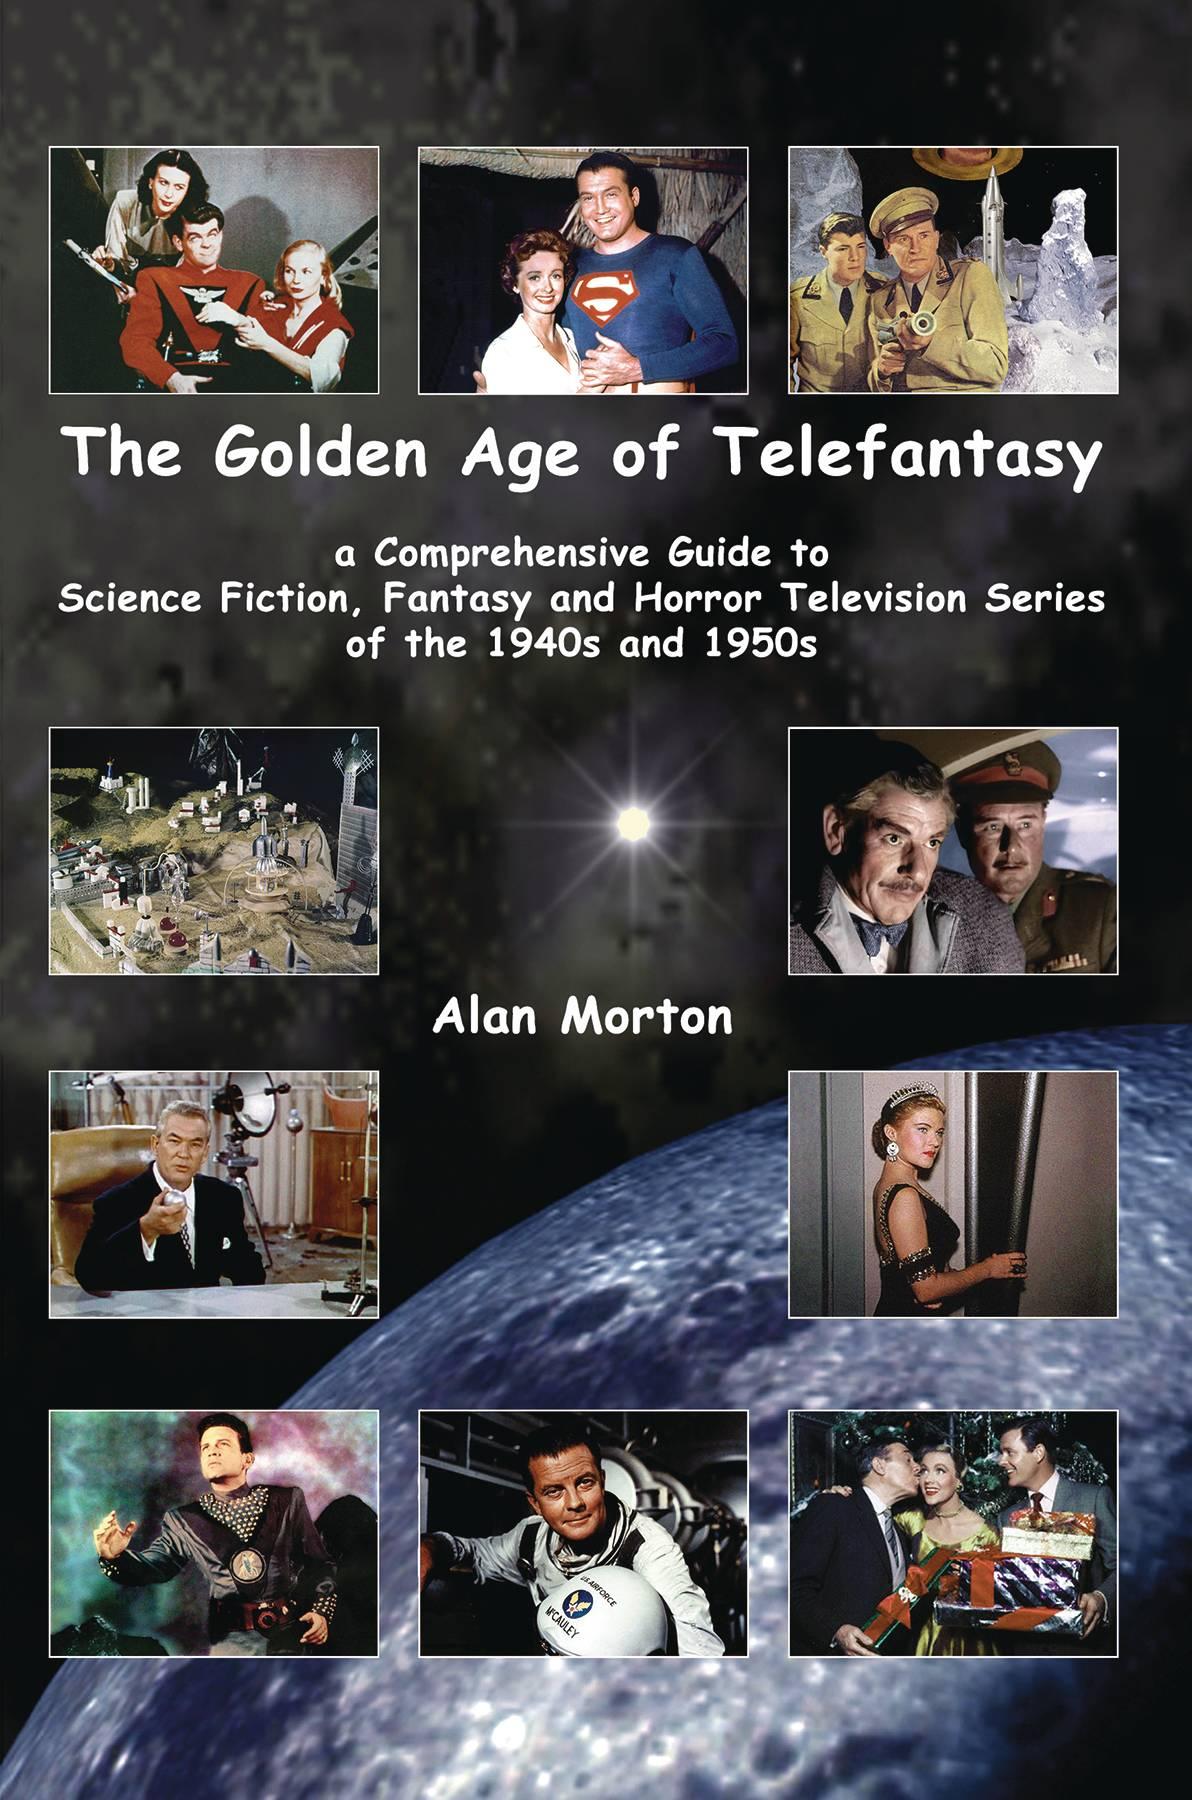 GOLDEN AGE TELEFANTASY GT SF FANTASY & HORROR 40S & 50S